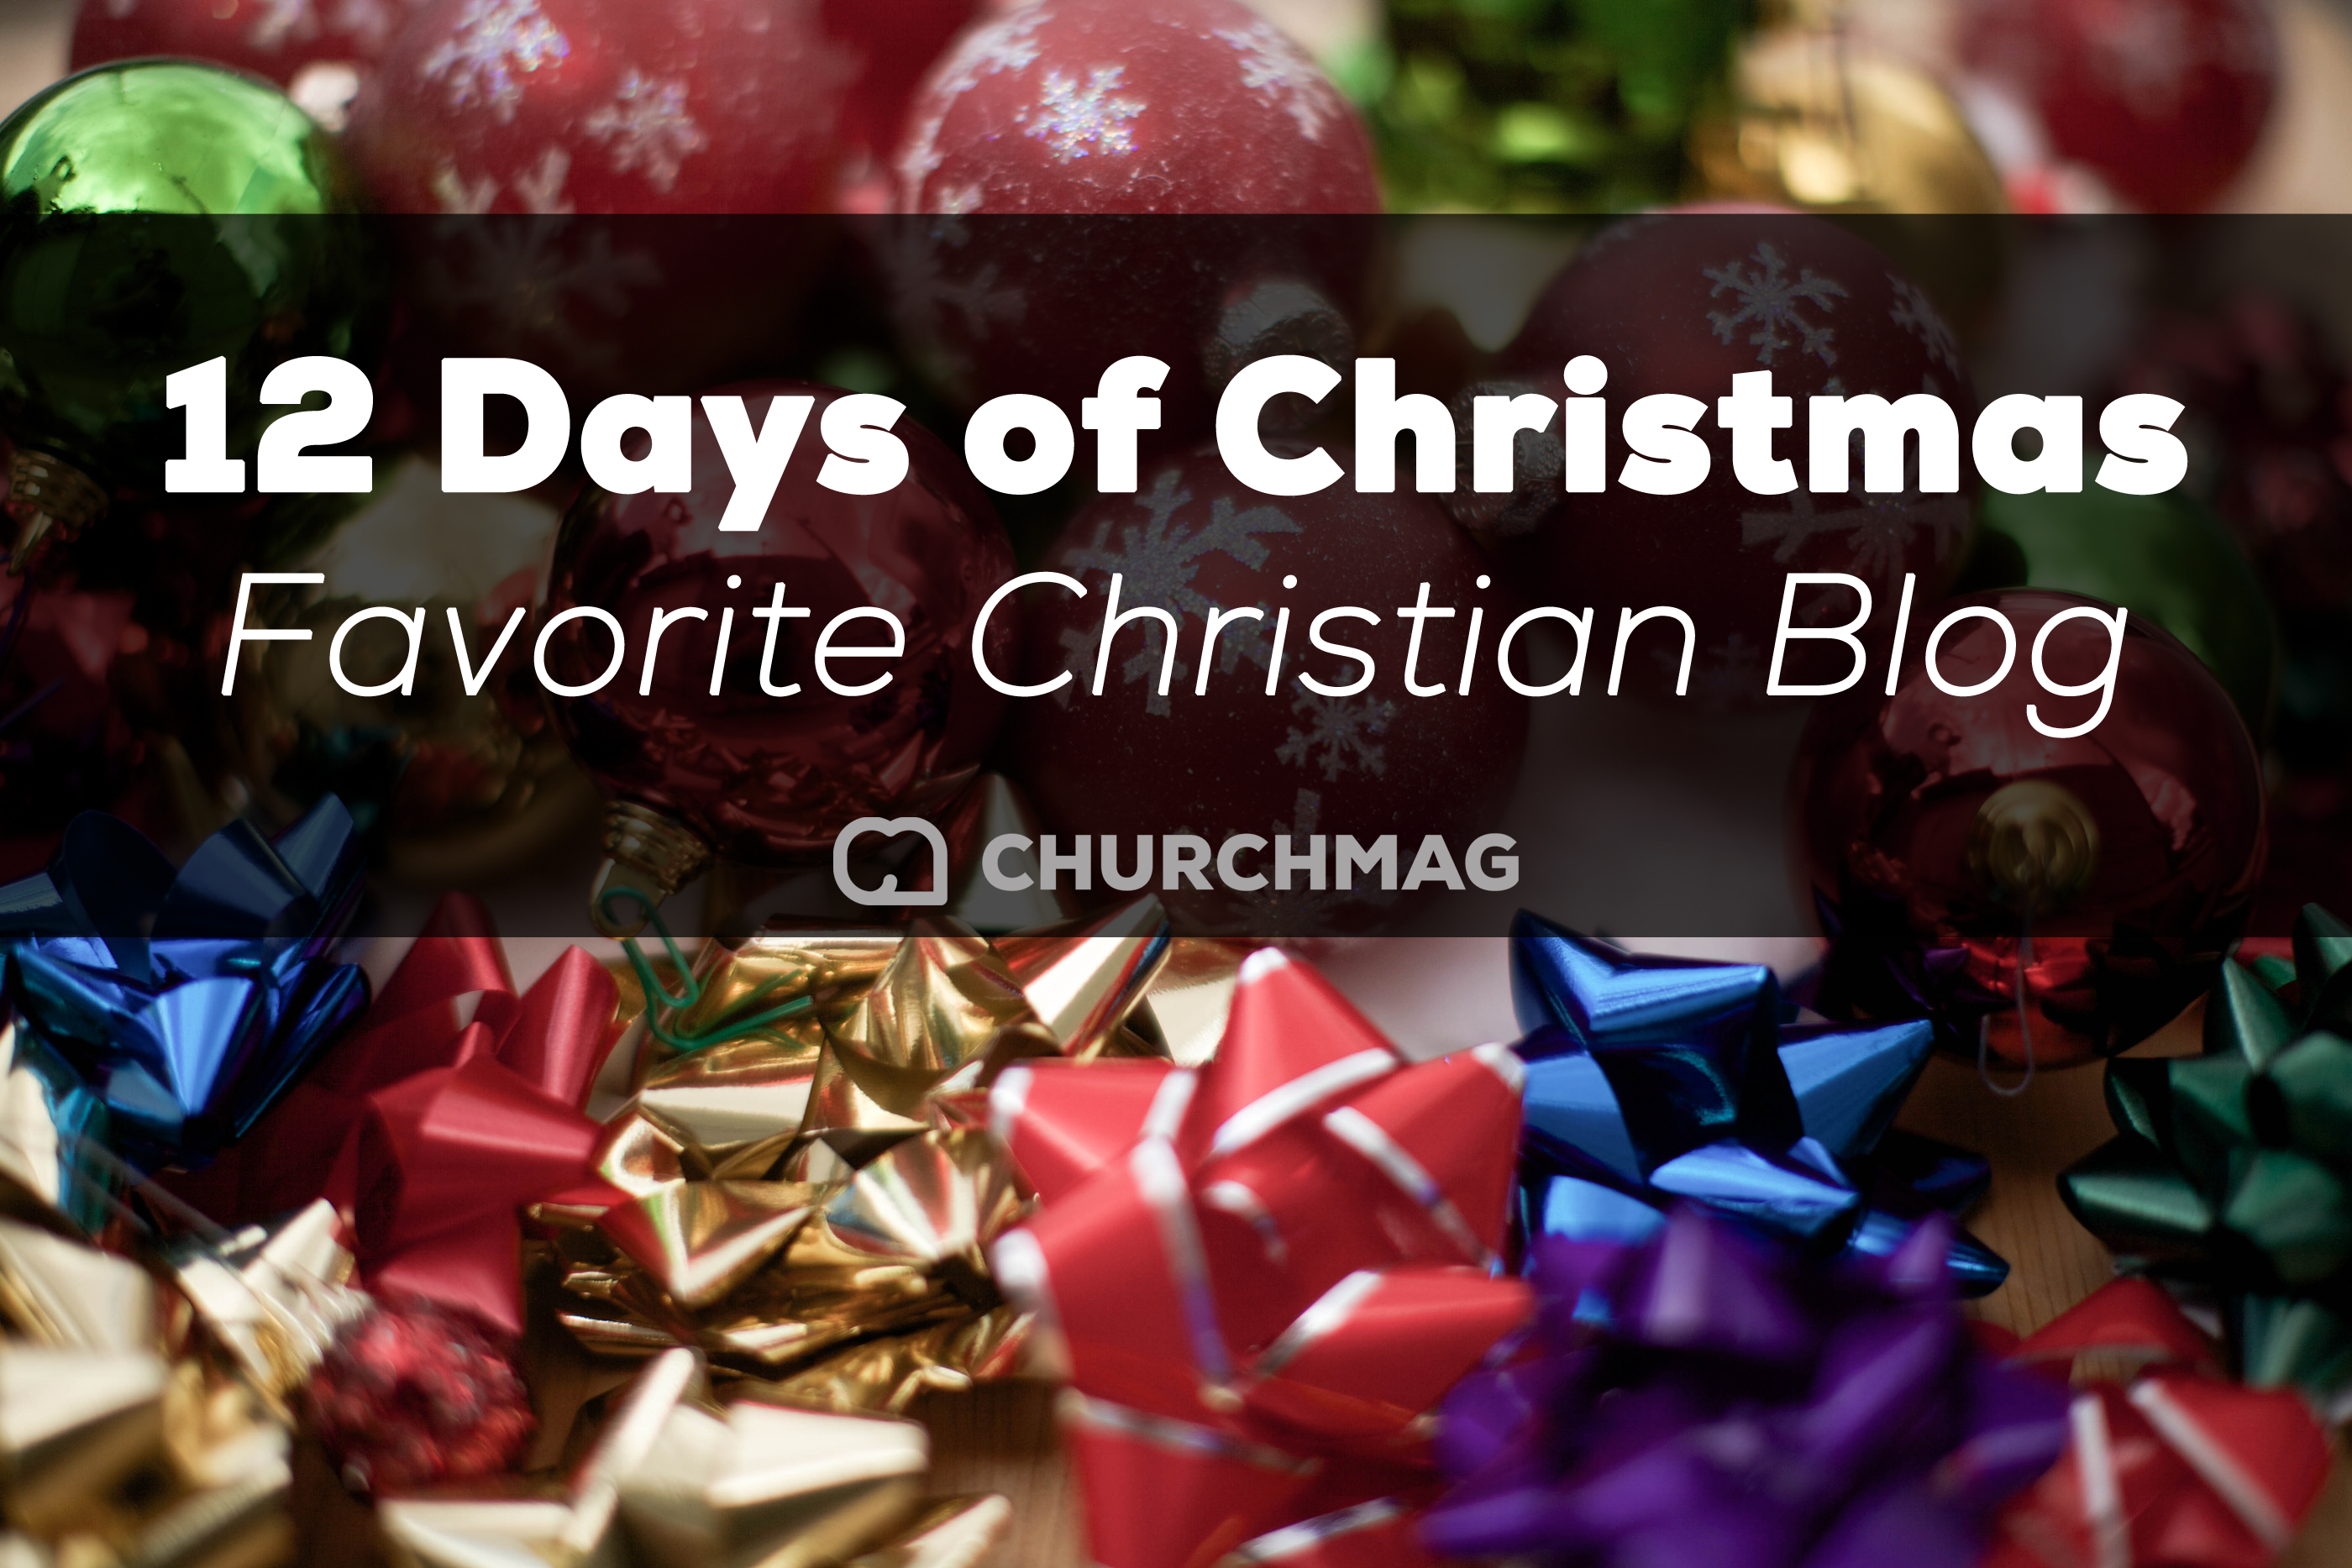 12 Days of ChurchMag Christmas: Favorite Christian Blog